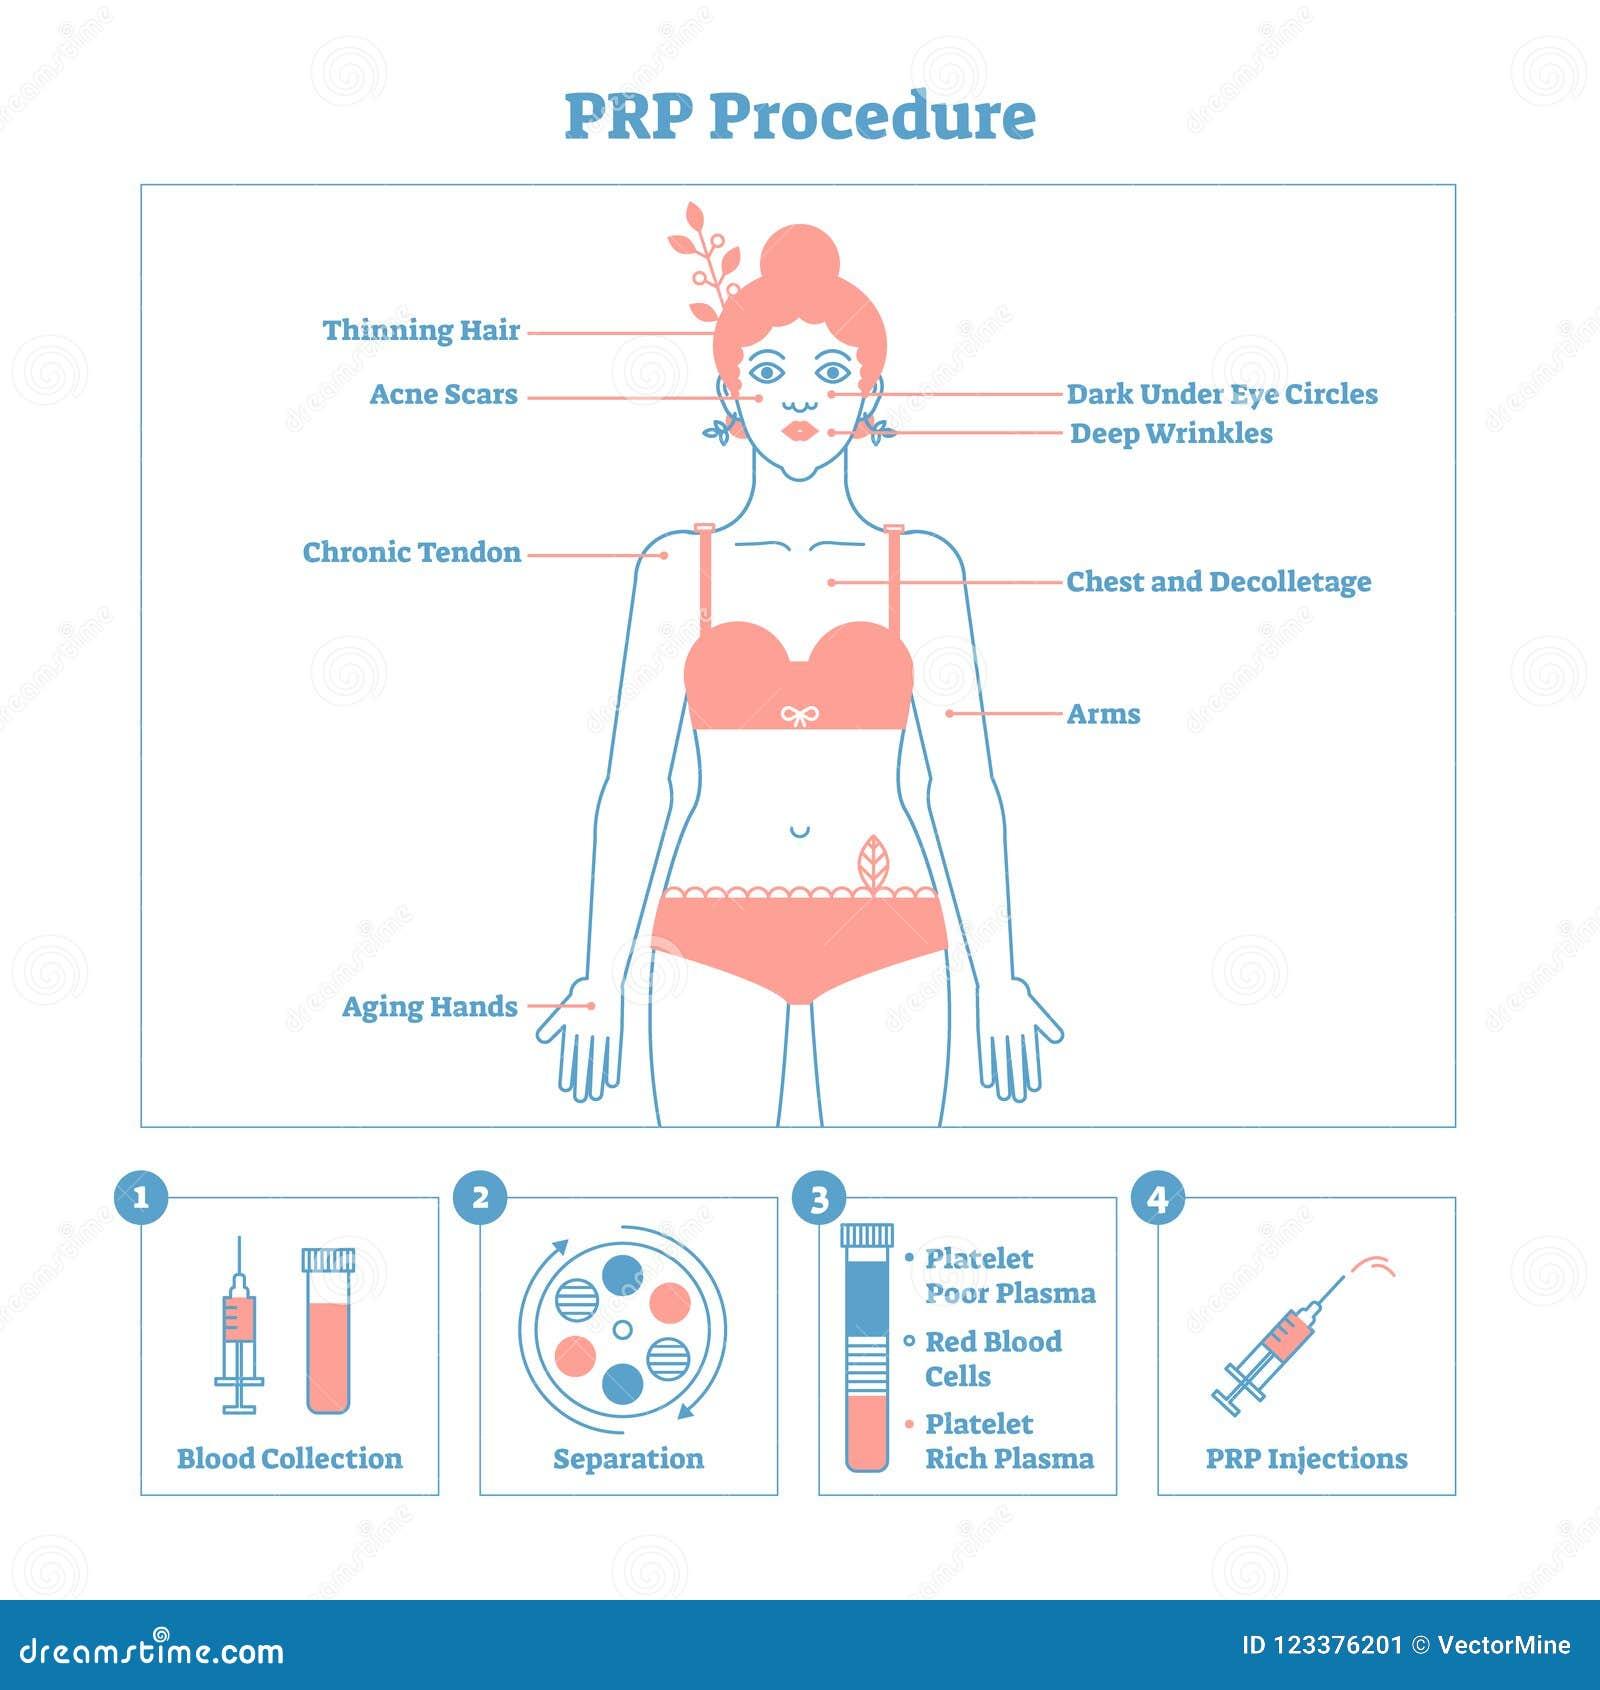 PRP γραφικό διάγραμμα απεικόνισης διαδικασίας διανυσματικό, cosmetology σχέδιο διαδικασίας Ομορφιά γυναικών και skincare